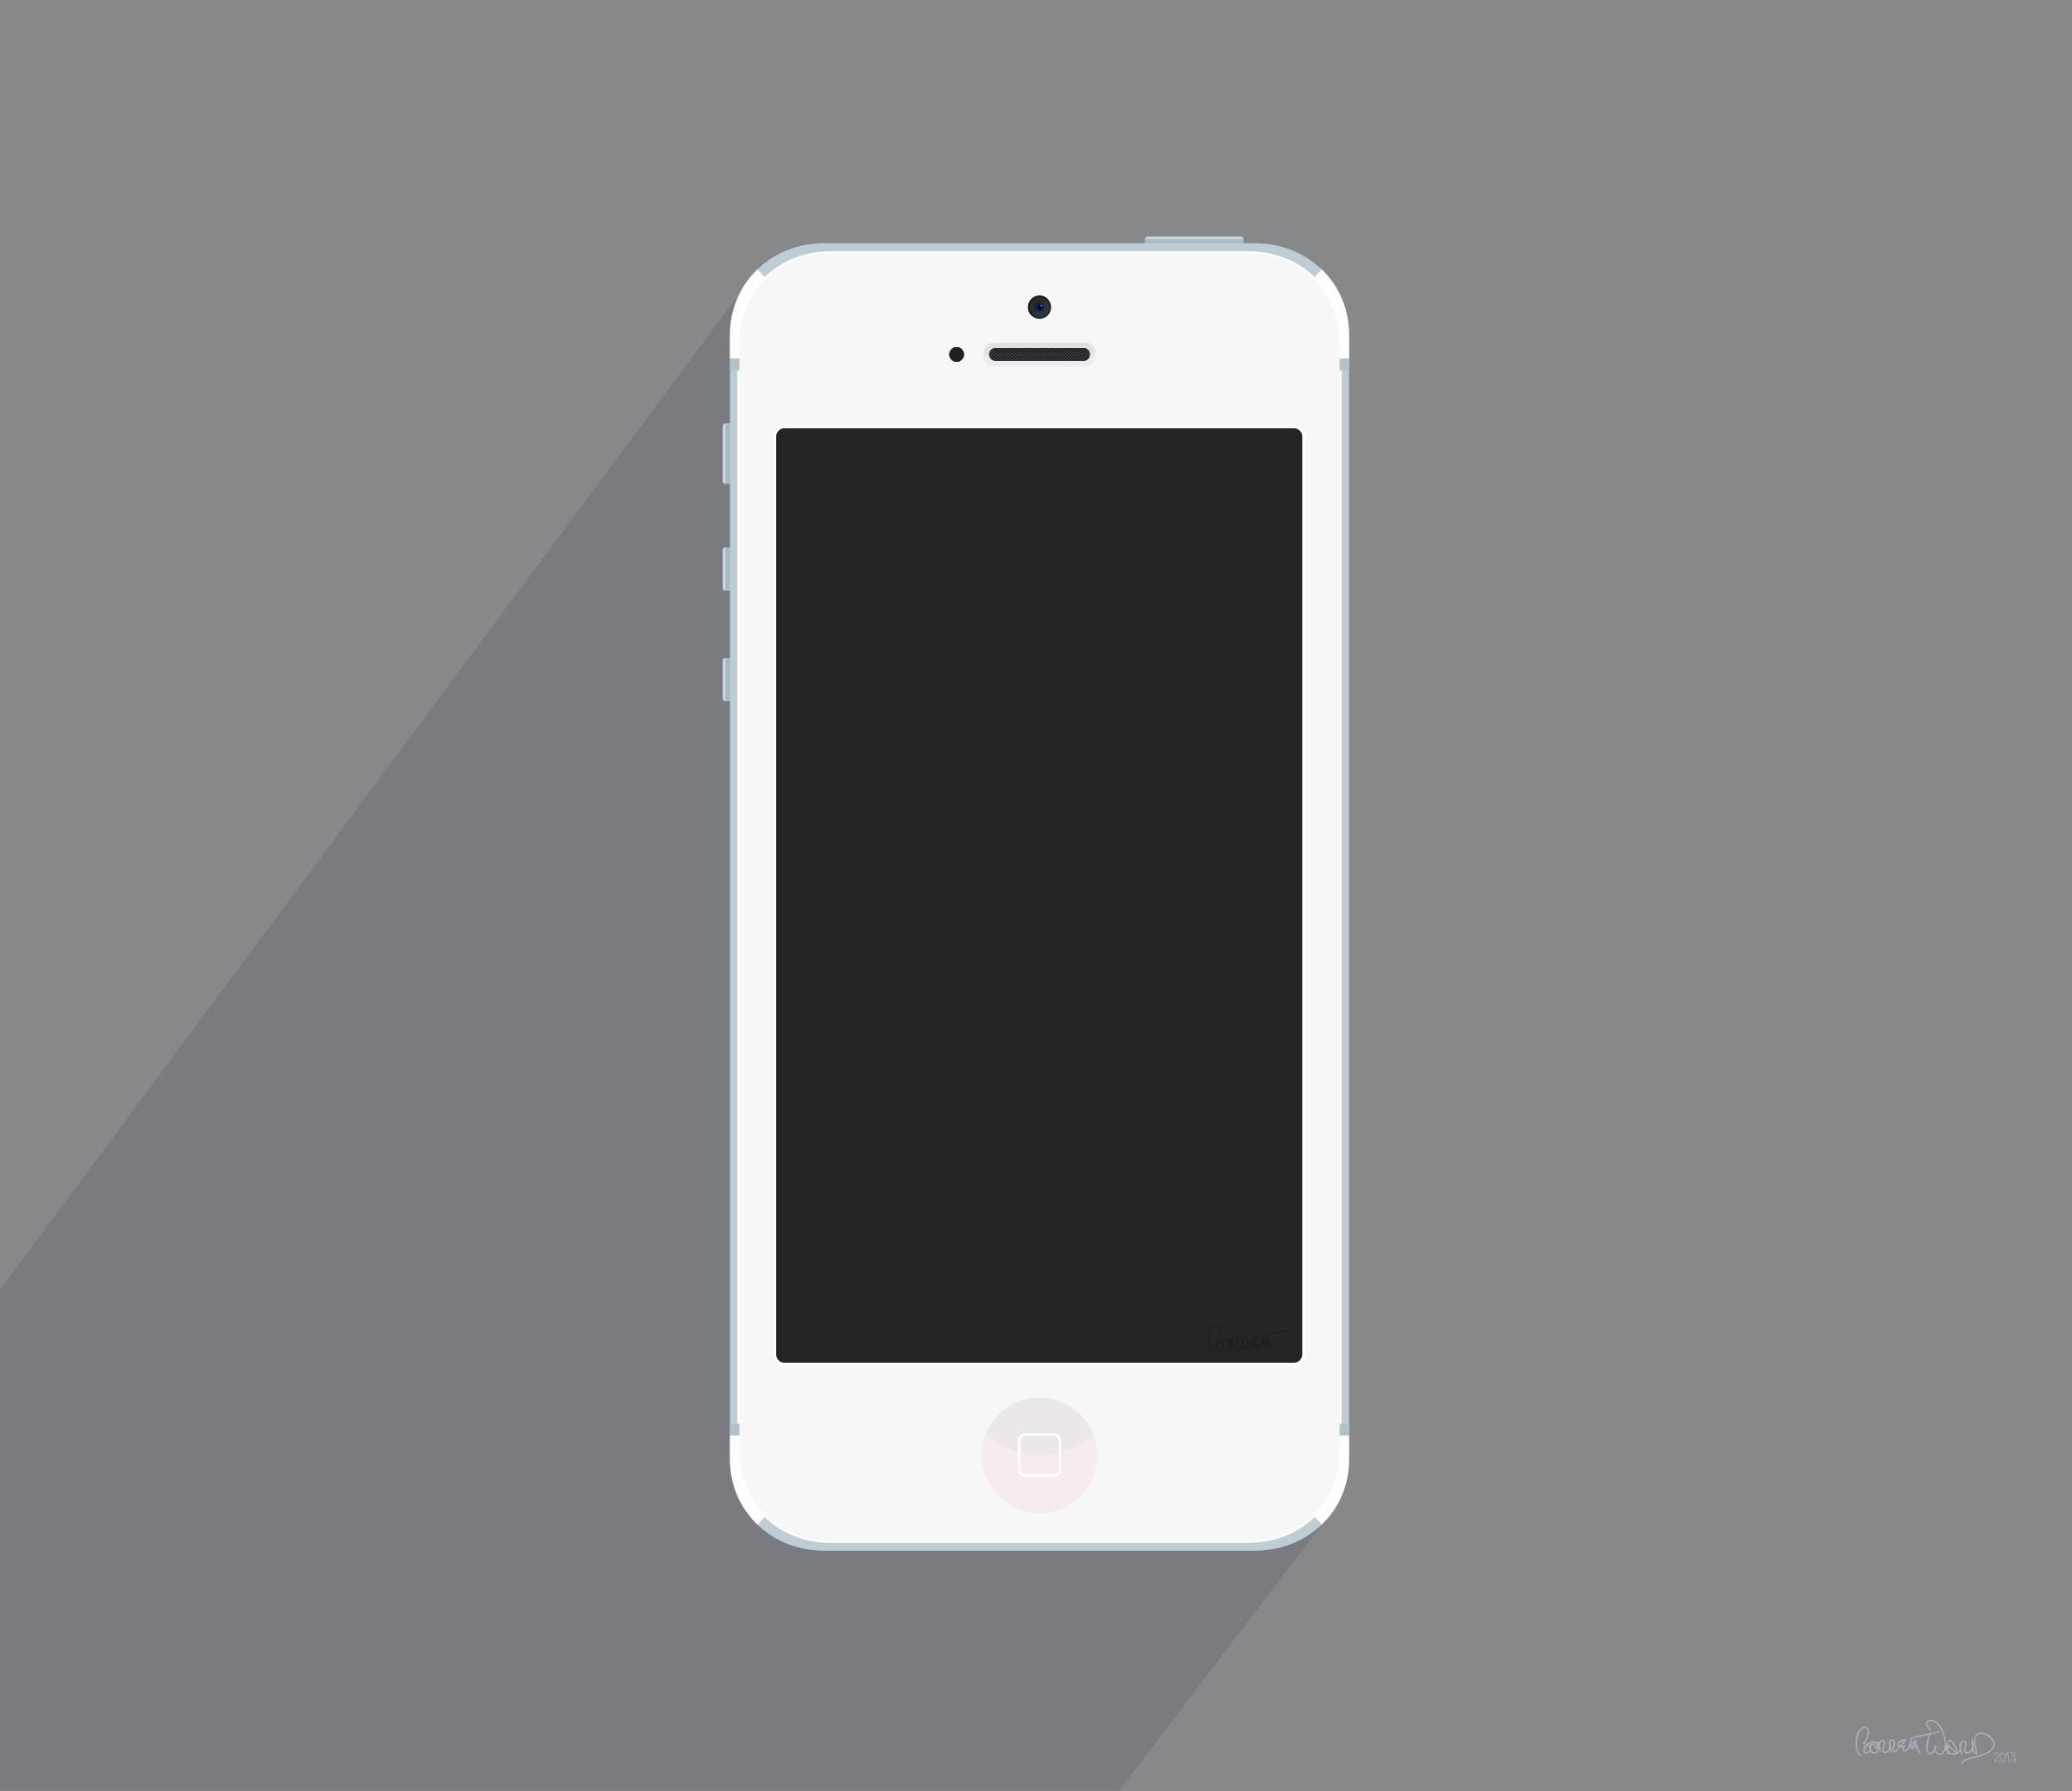 Iphone 5c clipart jpg Apple Iphone Clipart - Free Clipart jpg